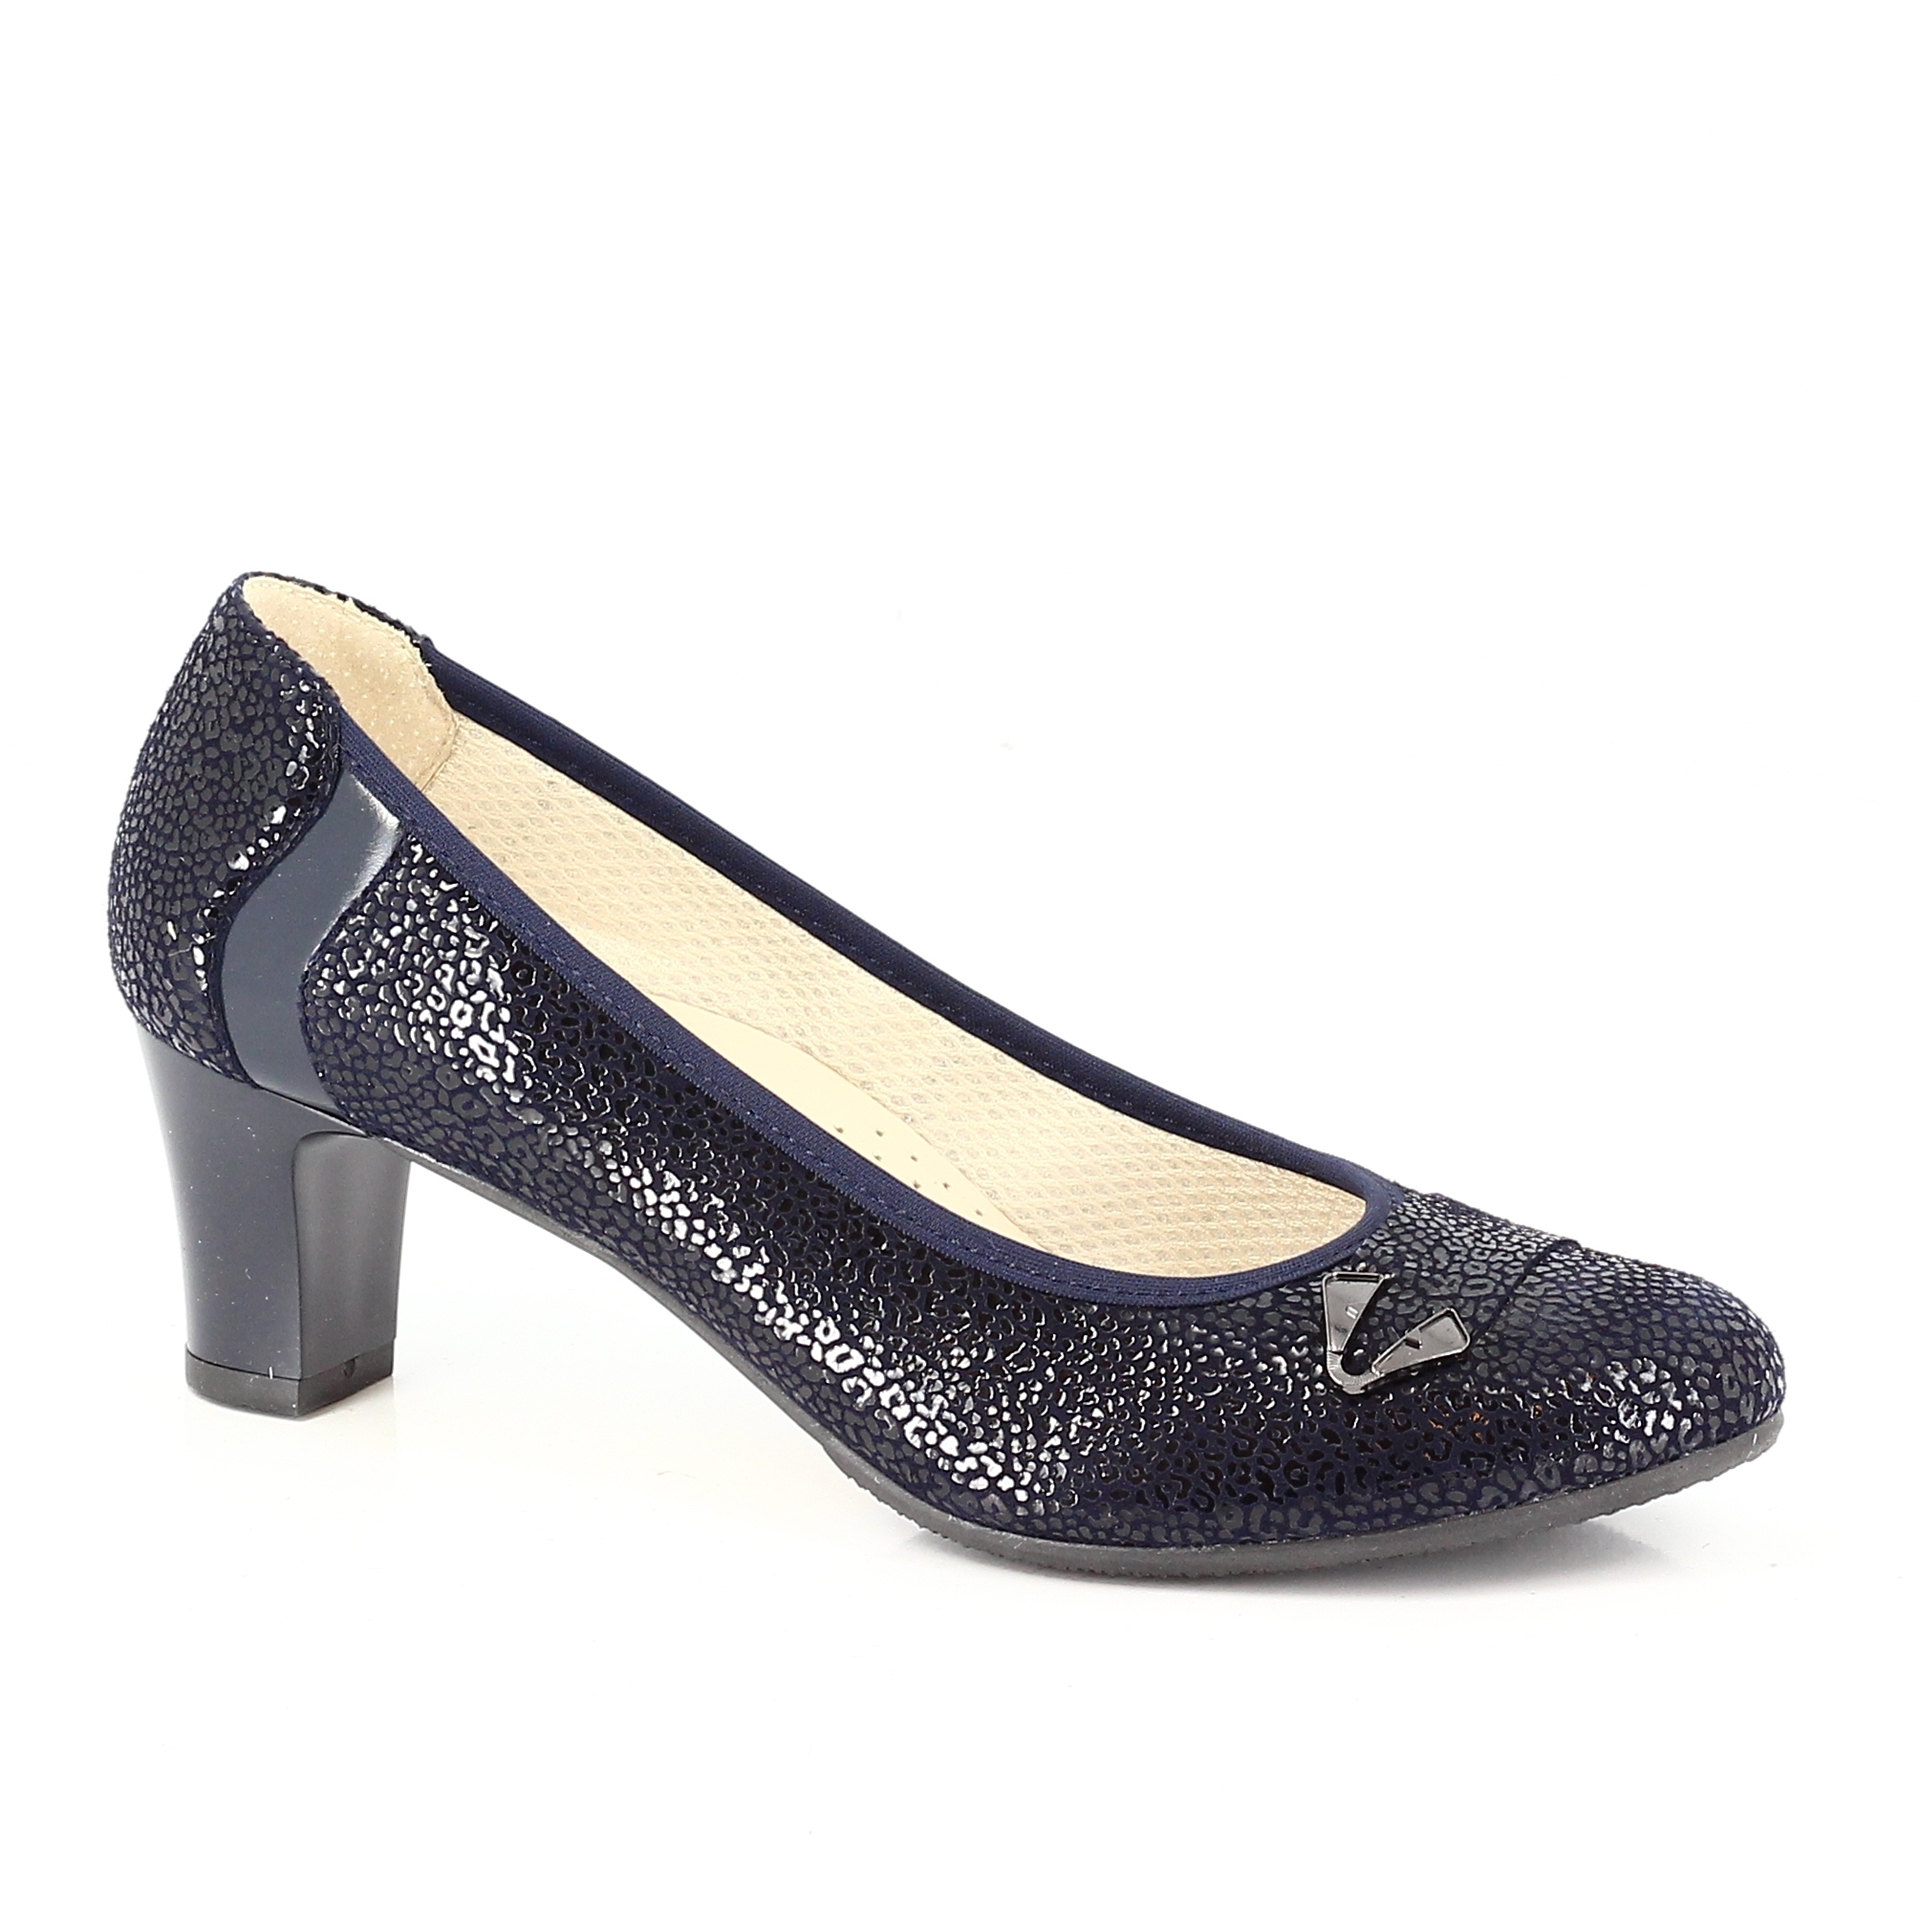 Bercolini Kényelmes cipők Anis